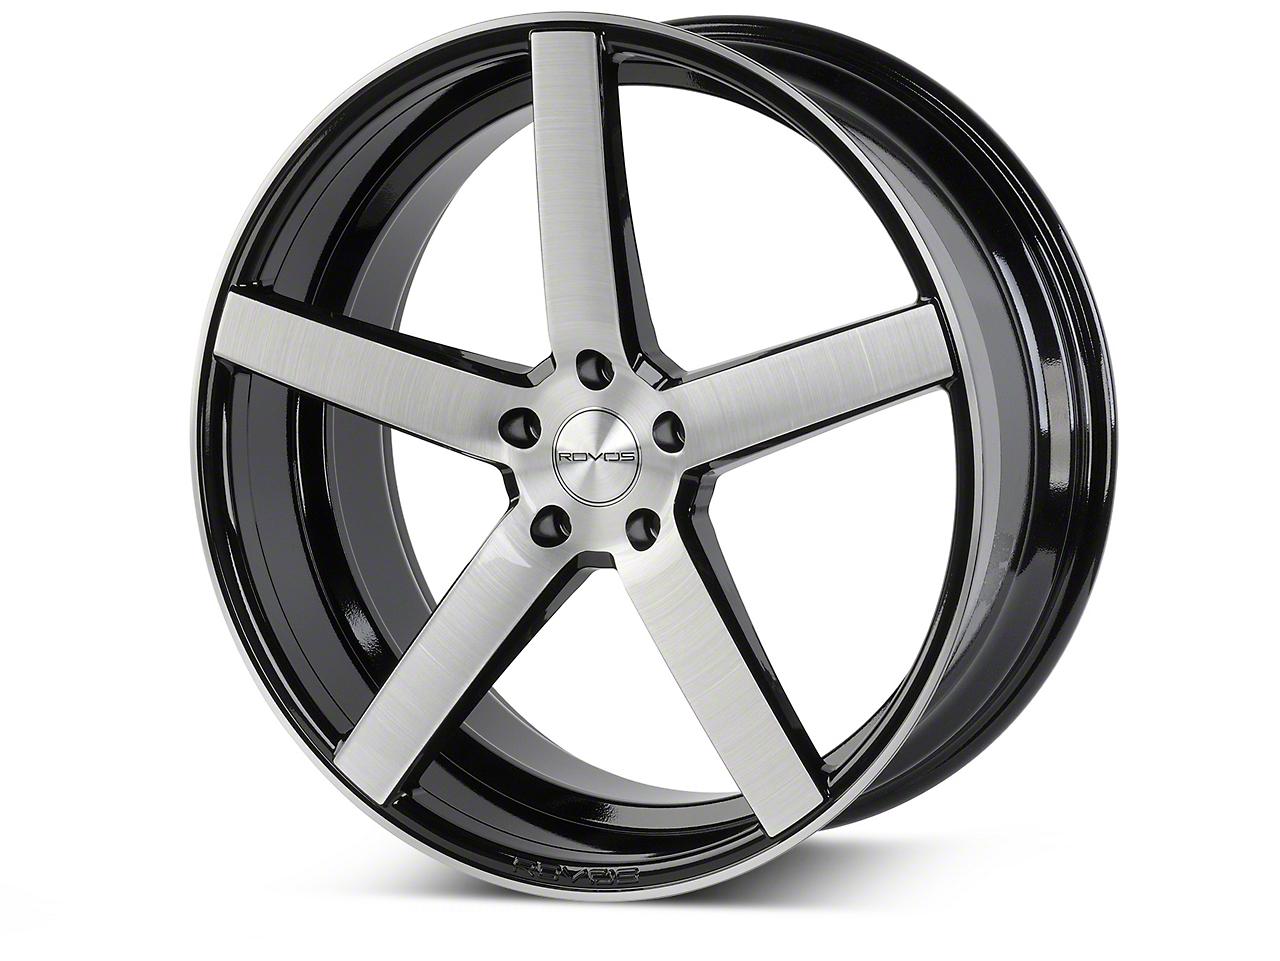 Rovos Durban Gloss Black Brushed Wheel - 20x10 (15-18 GT, EcoBoost, V6)